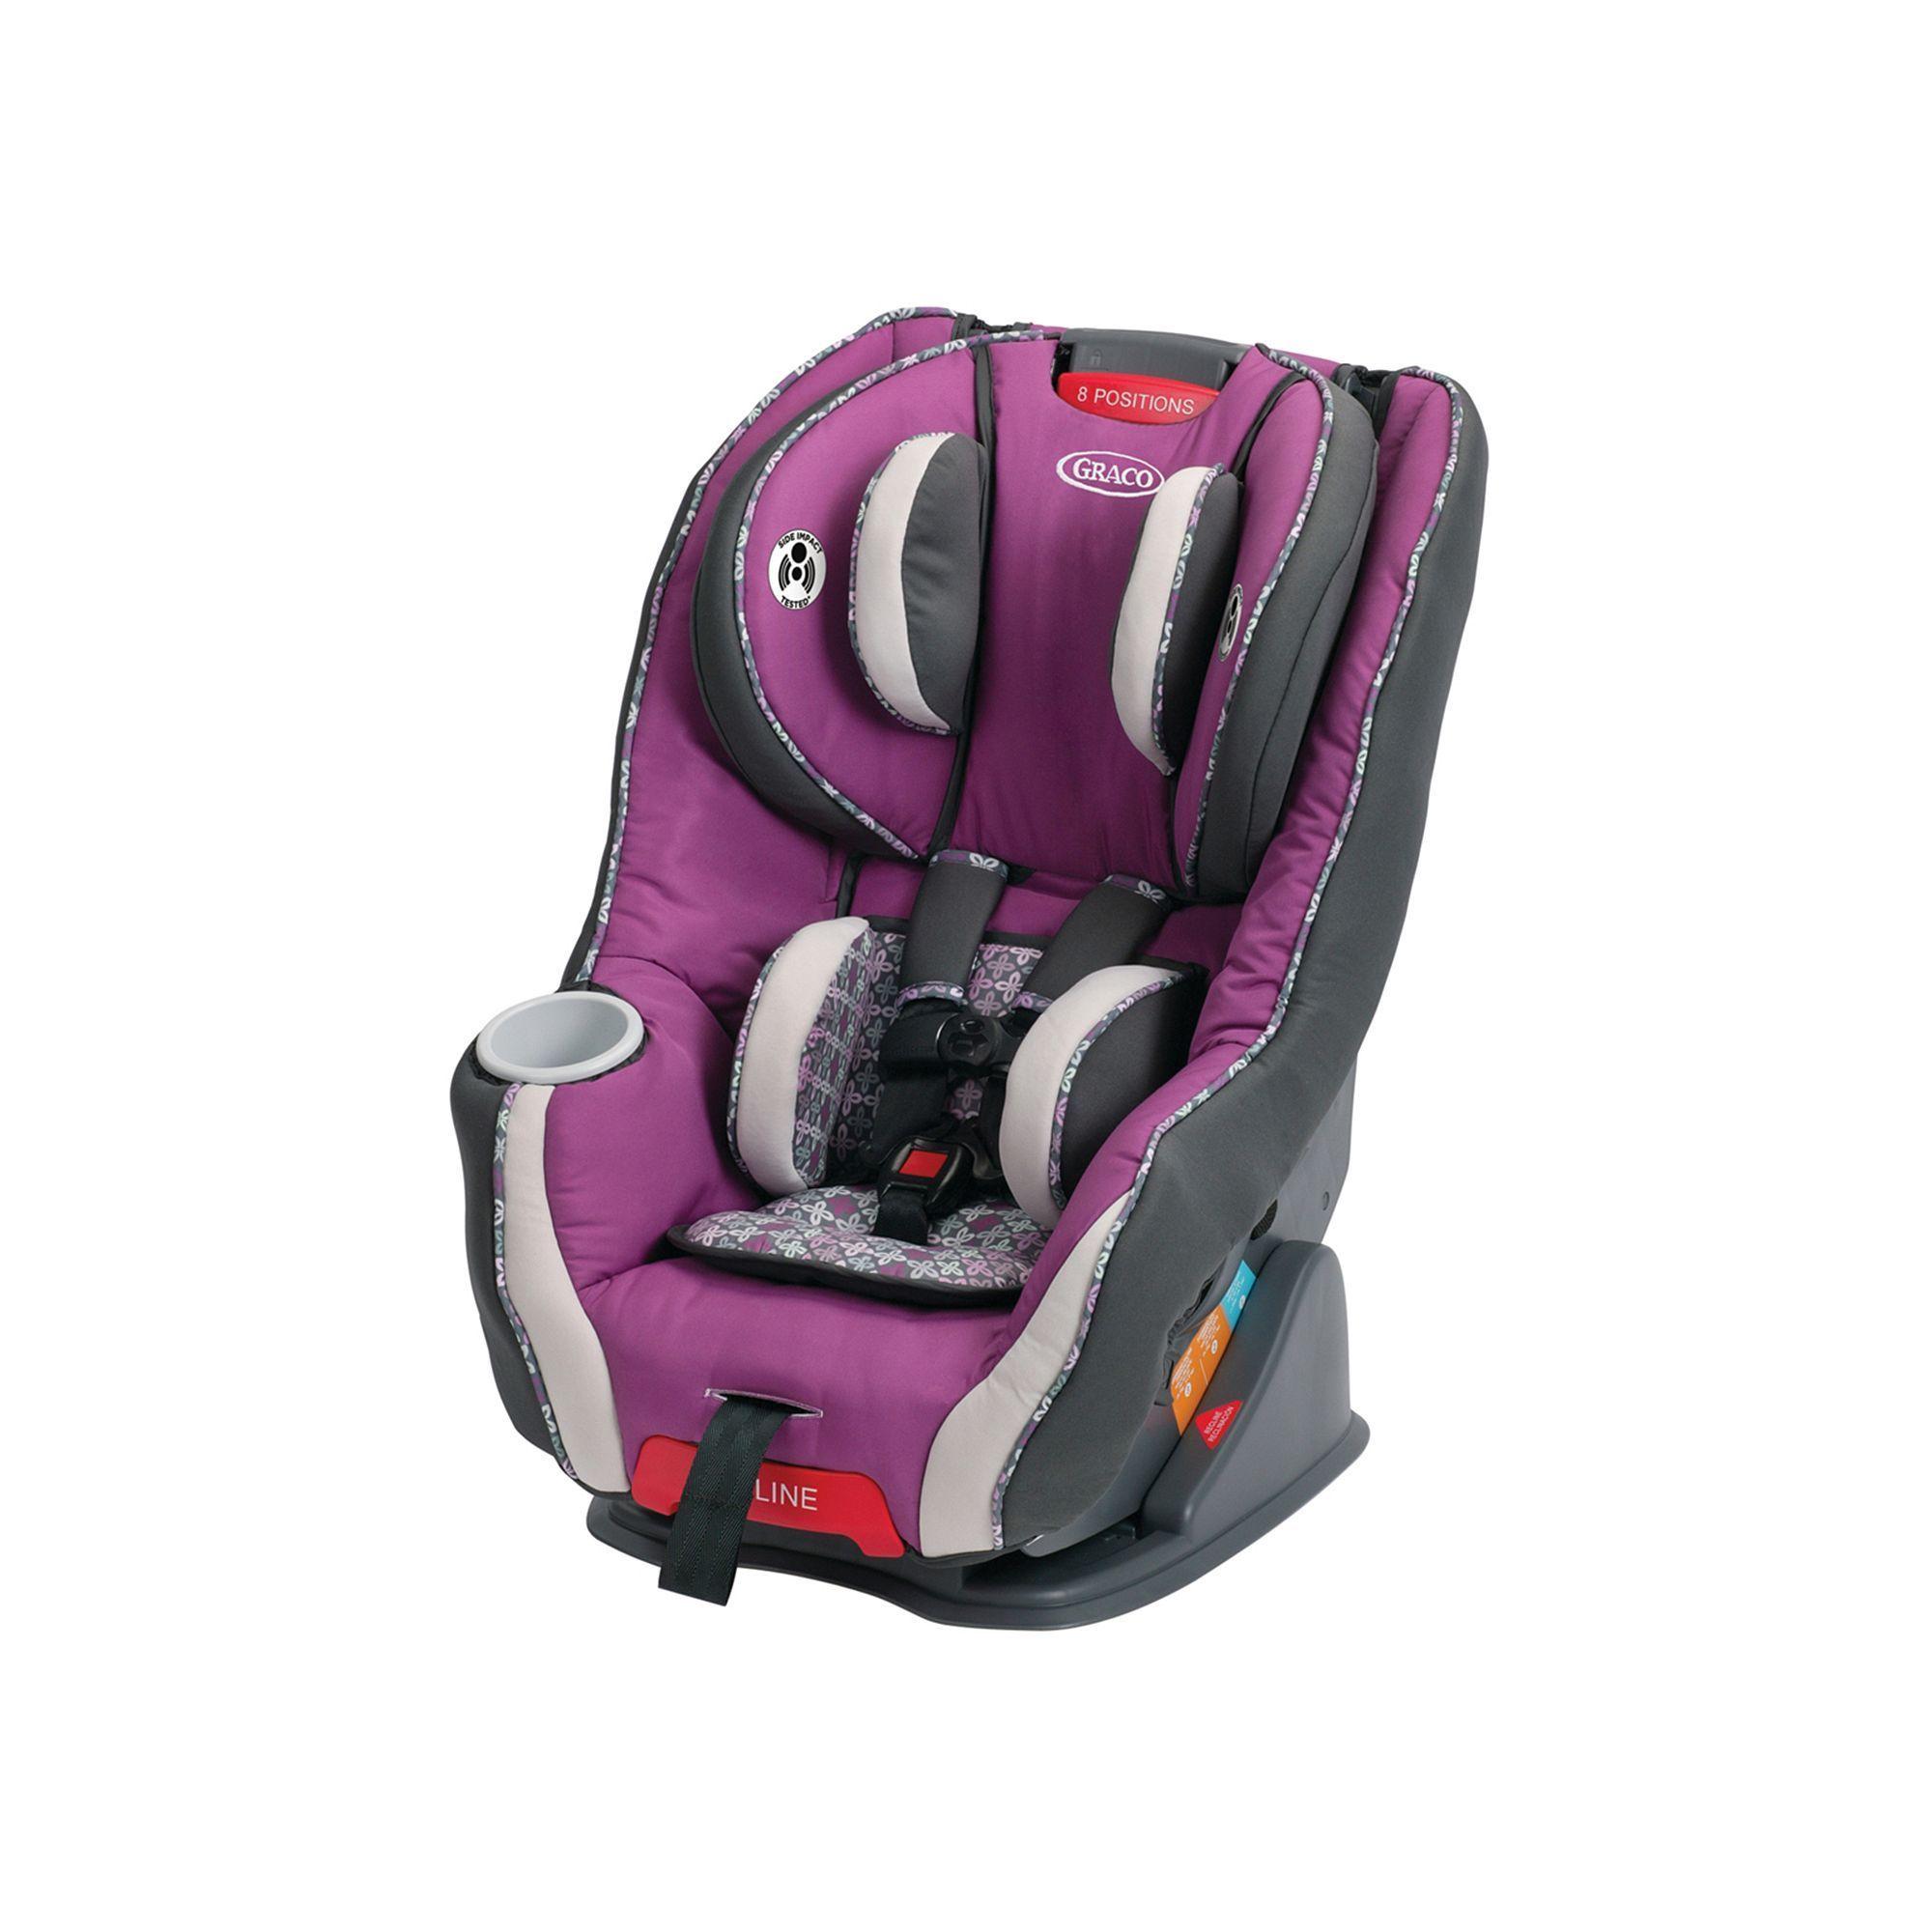 Medium Crop Of Graco Size4me 65 Convertible Car Seat